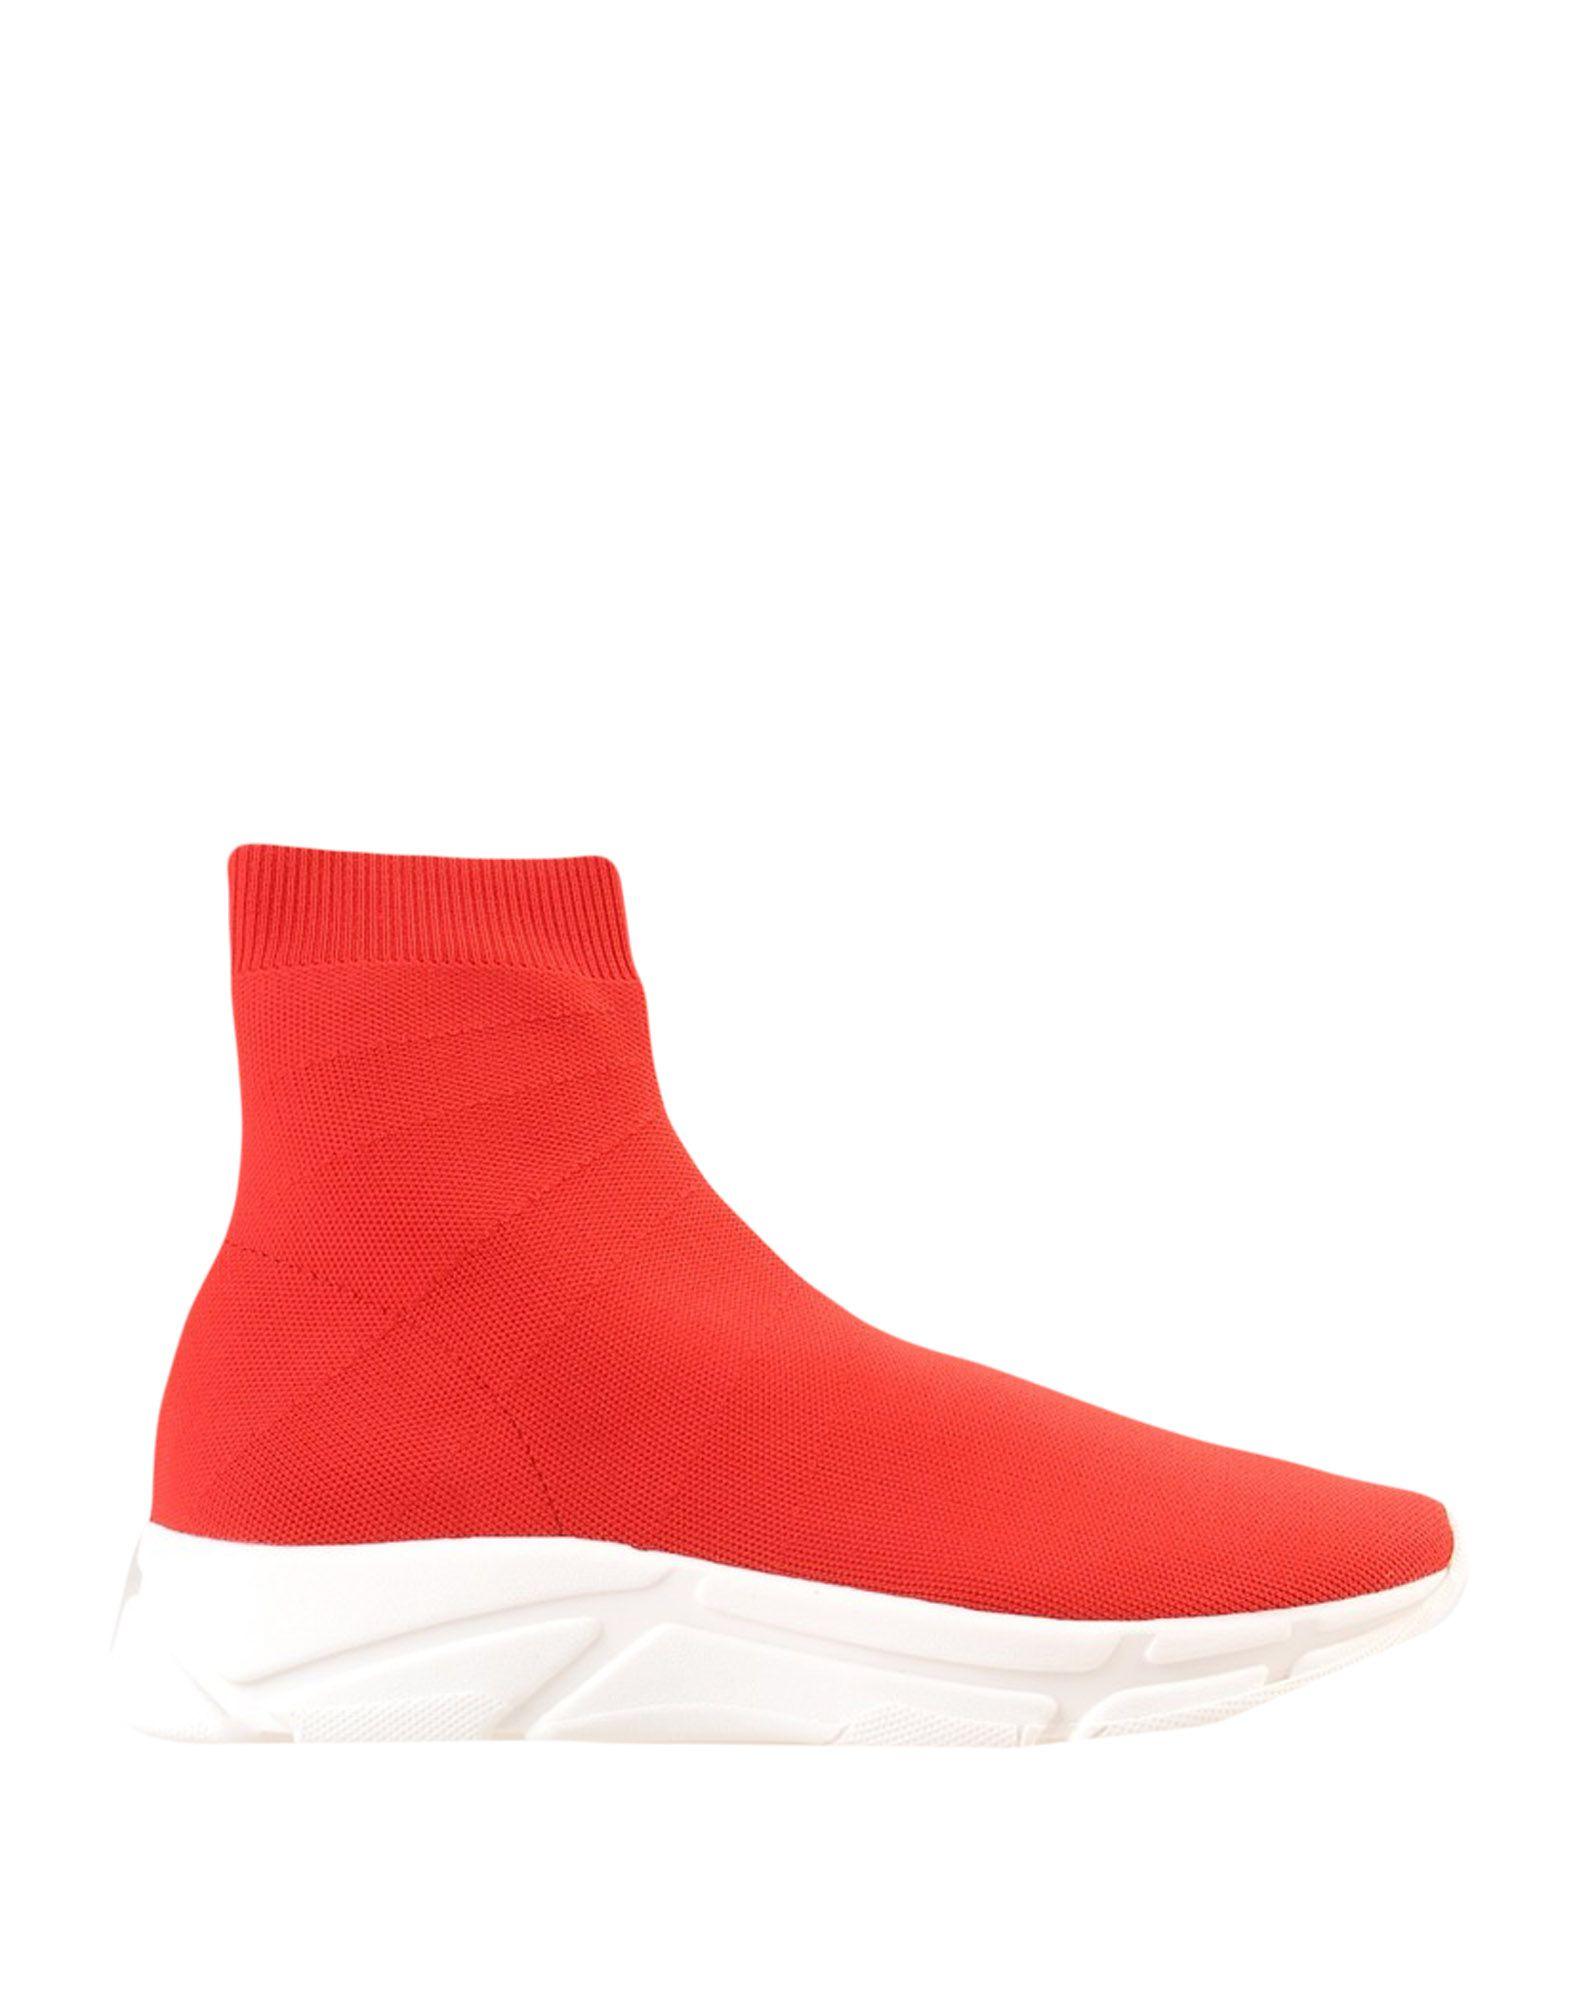 Steve Madden Bitten - Sneakers - Women Steve Madden Sneakers - online on  Canada - Sneakers 11567405DI d8ccc3